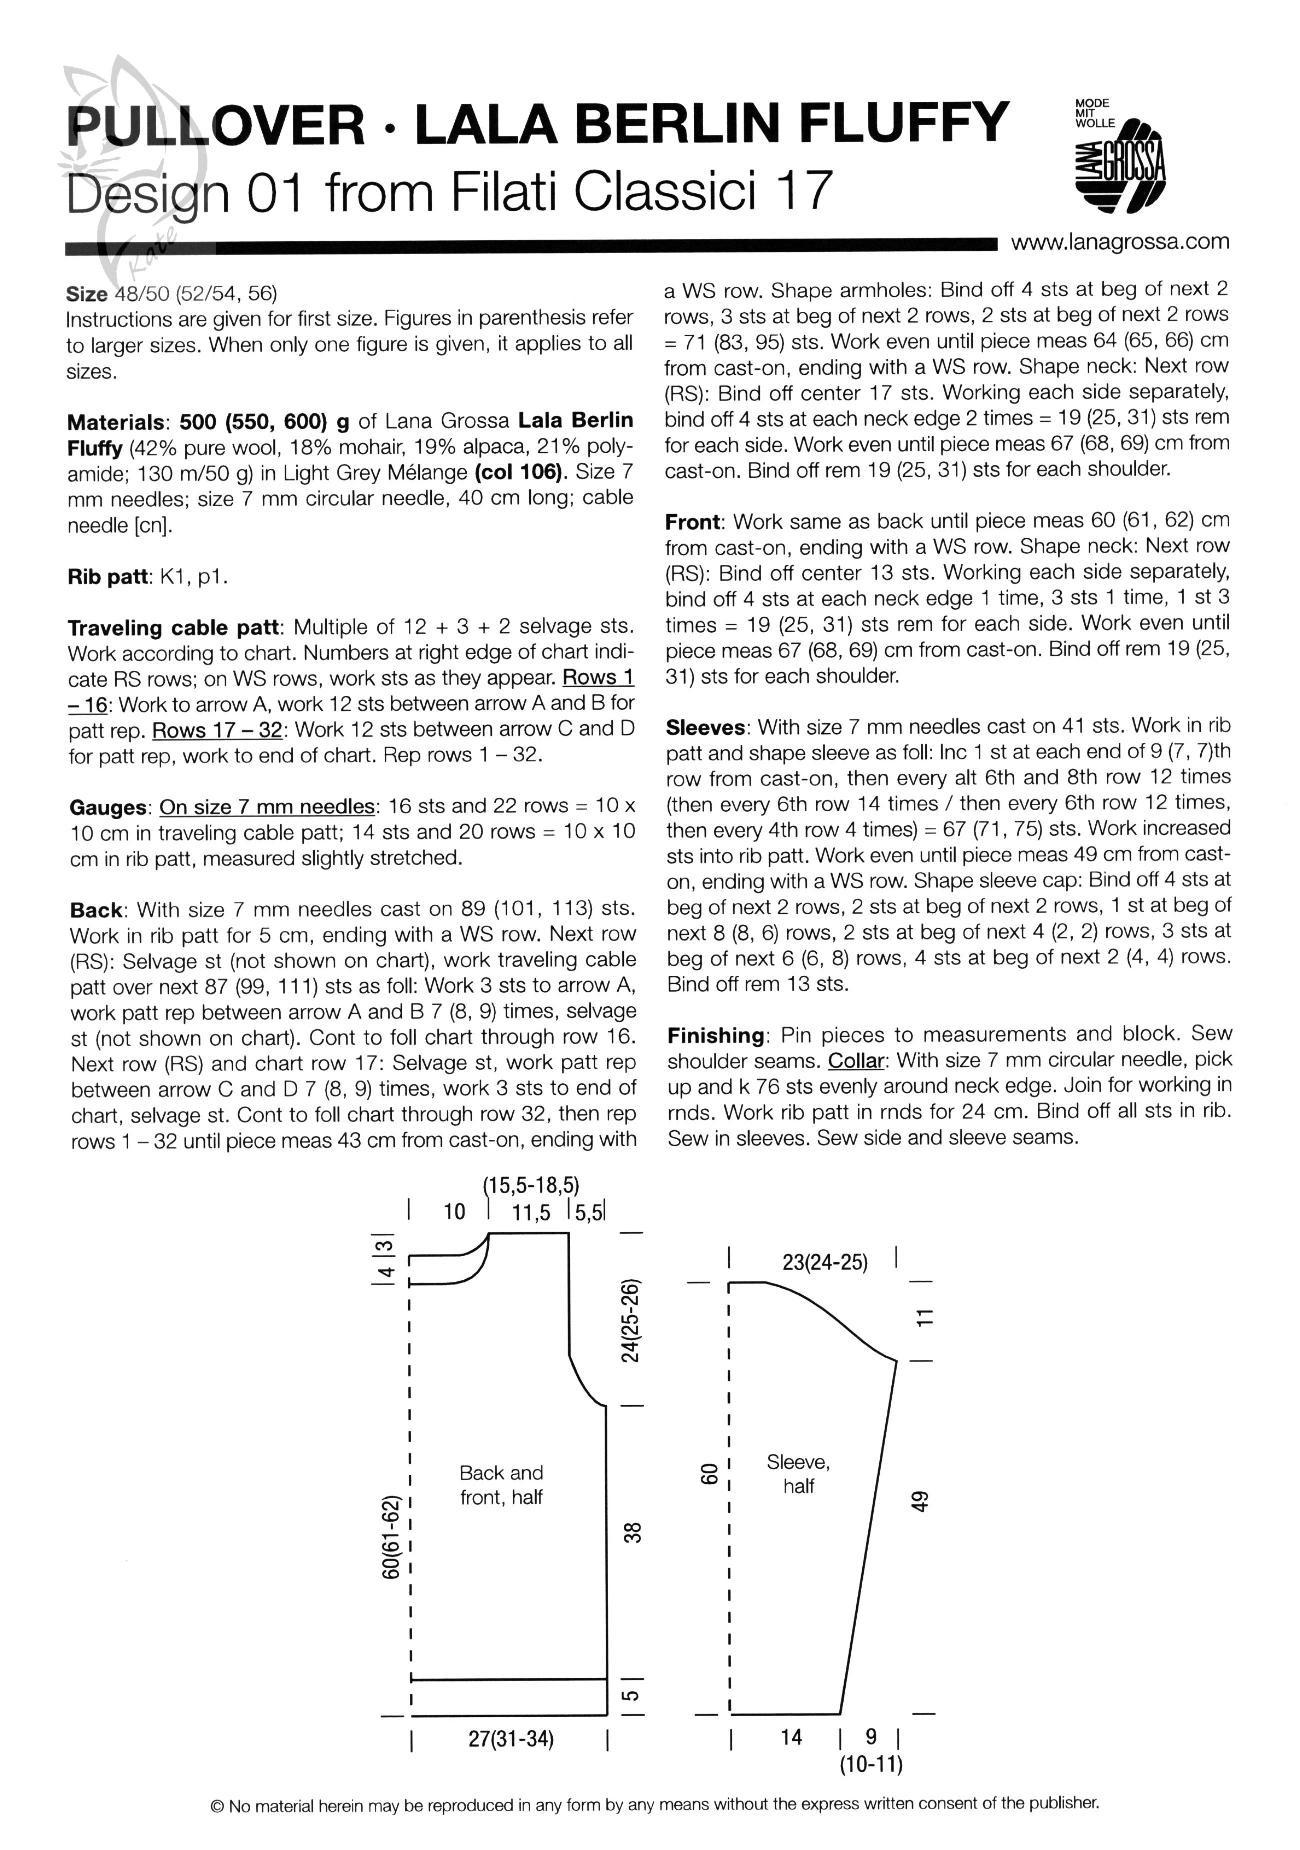 Page_00113.jpg